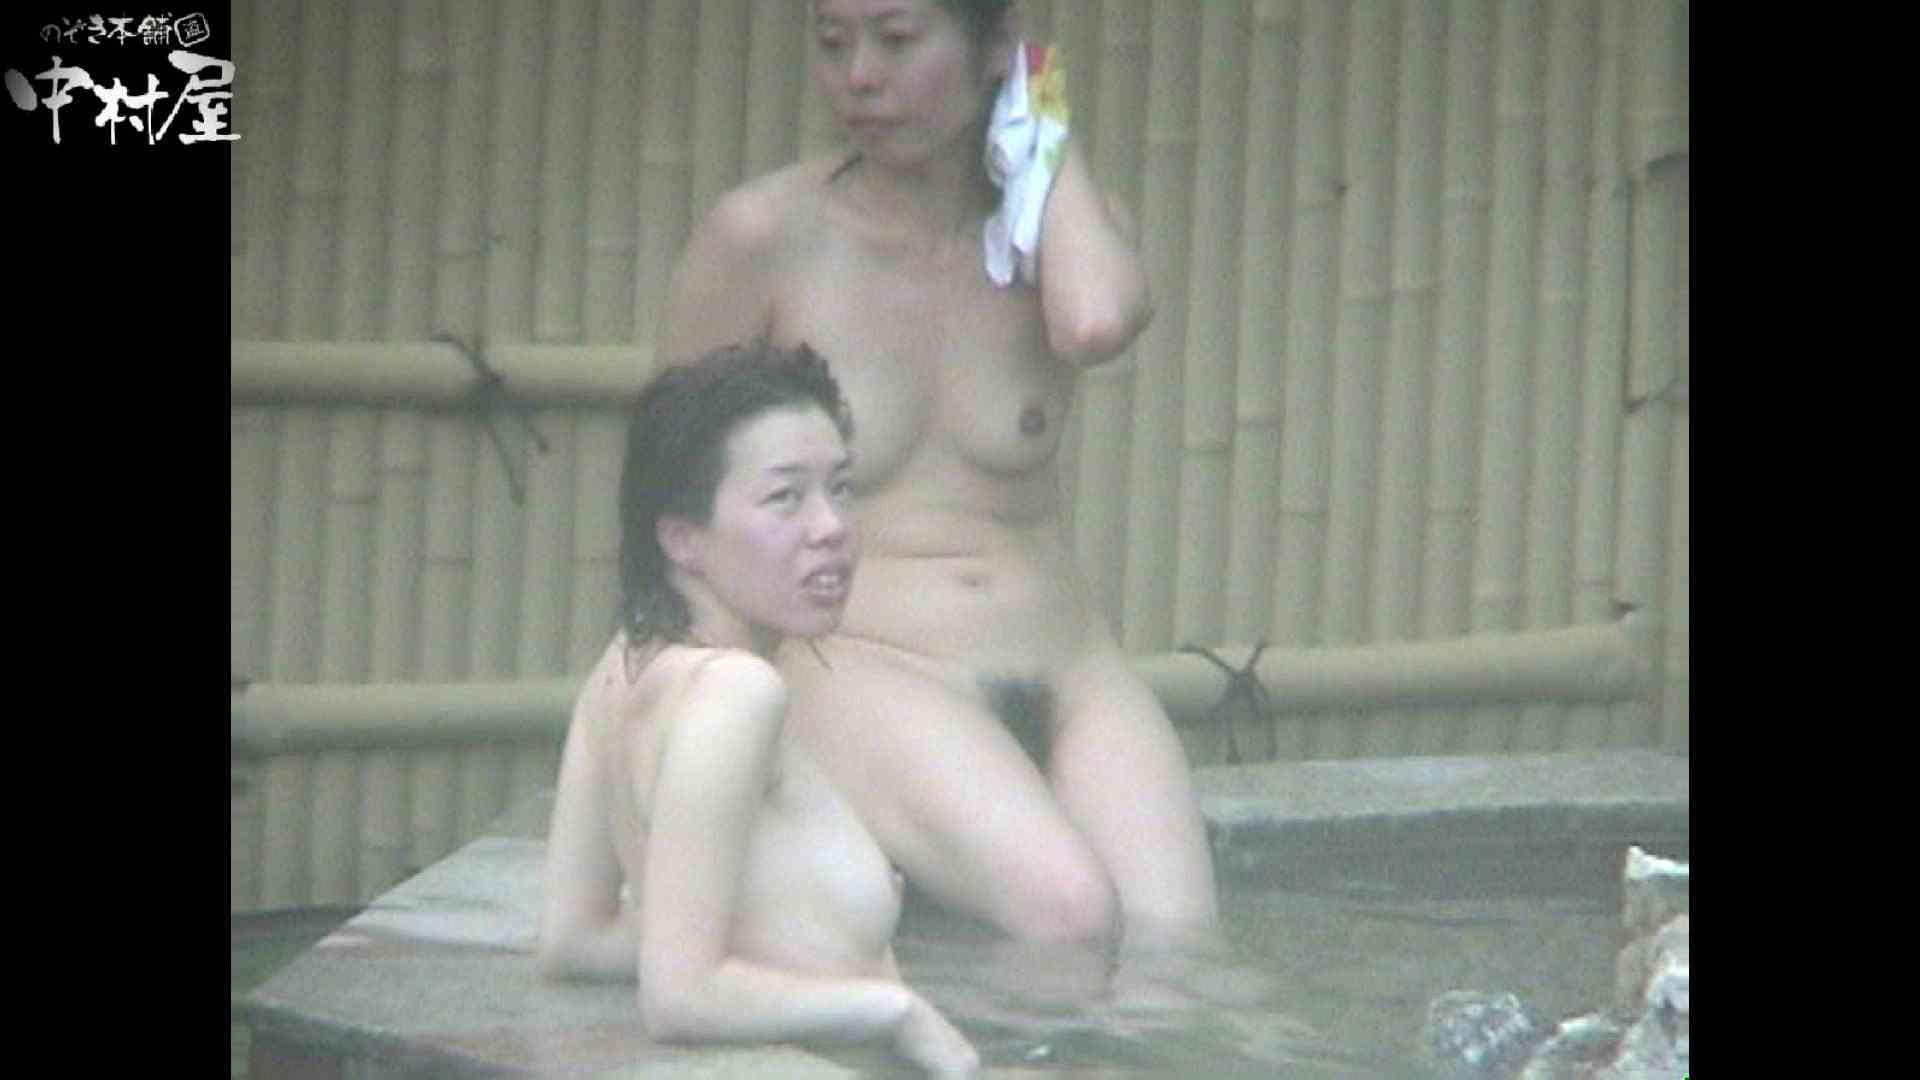 Aquaな露天風呂Vol.932 盗撮師作品  106pic 81